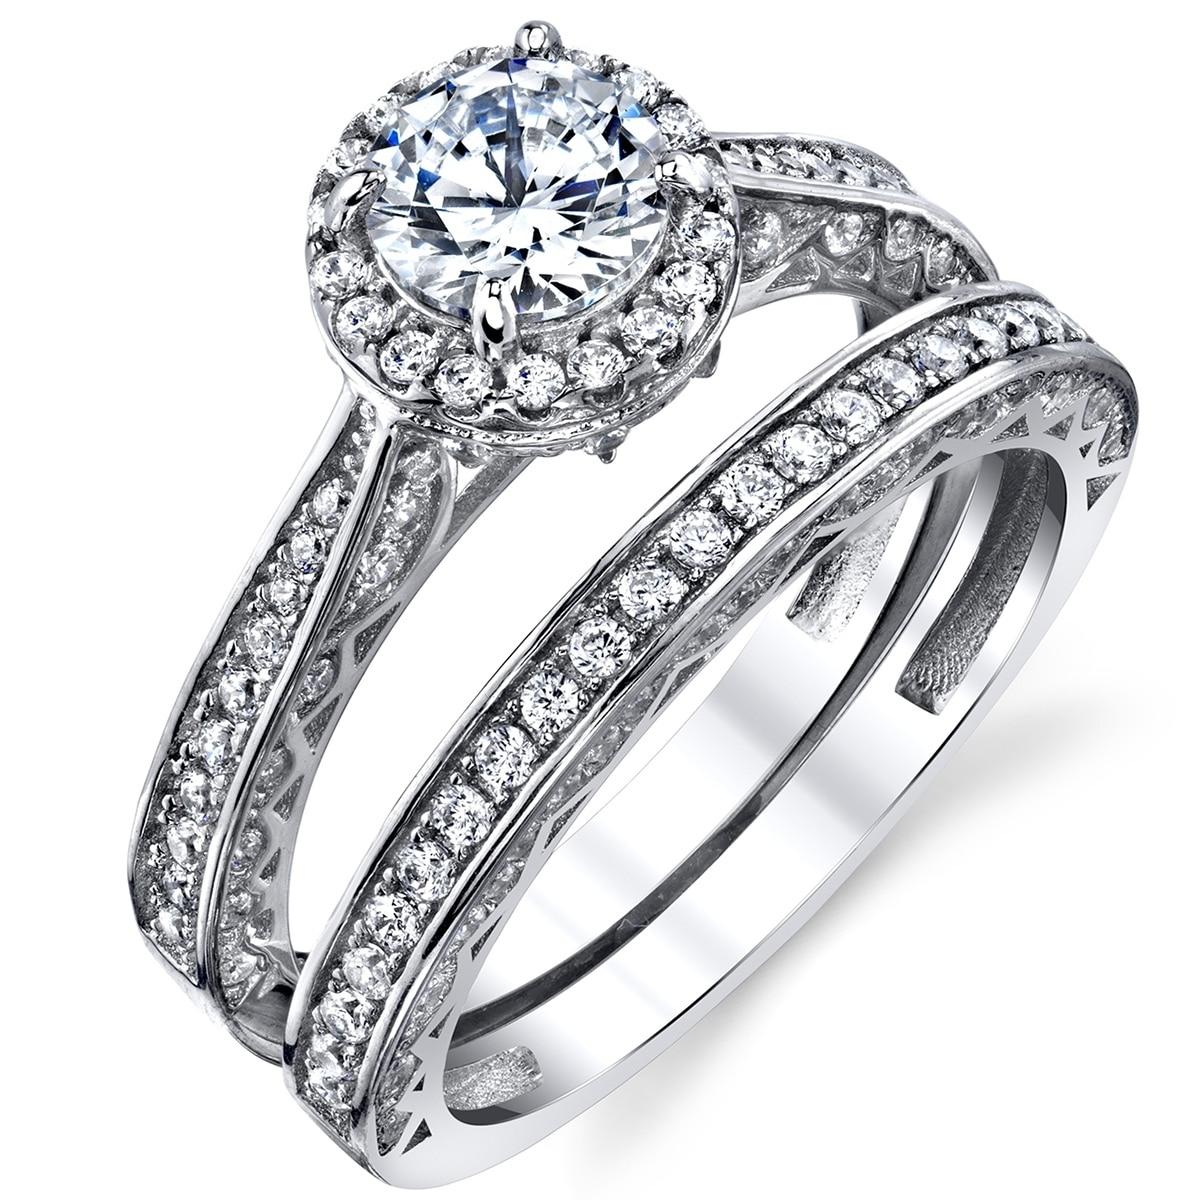 Shop Oliveti Sterling Silver 925 Engagement Rings Wedding Band Bridal Set Round Cz Overstock 22694931 5